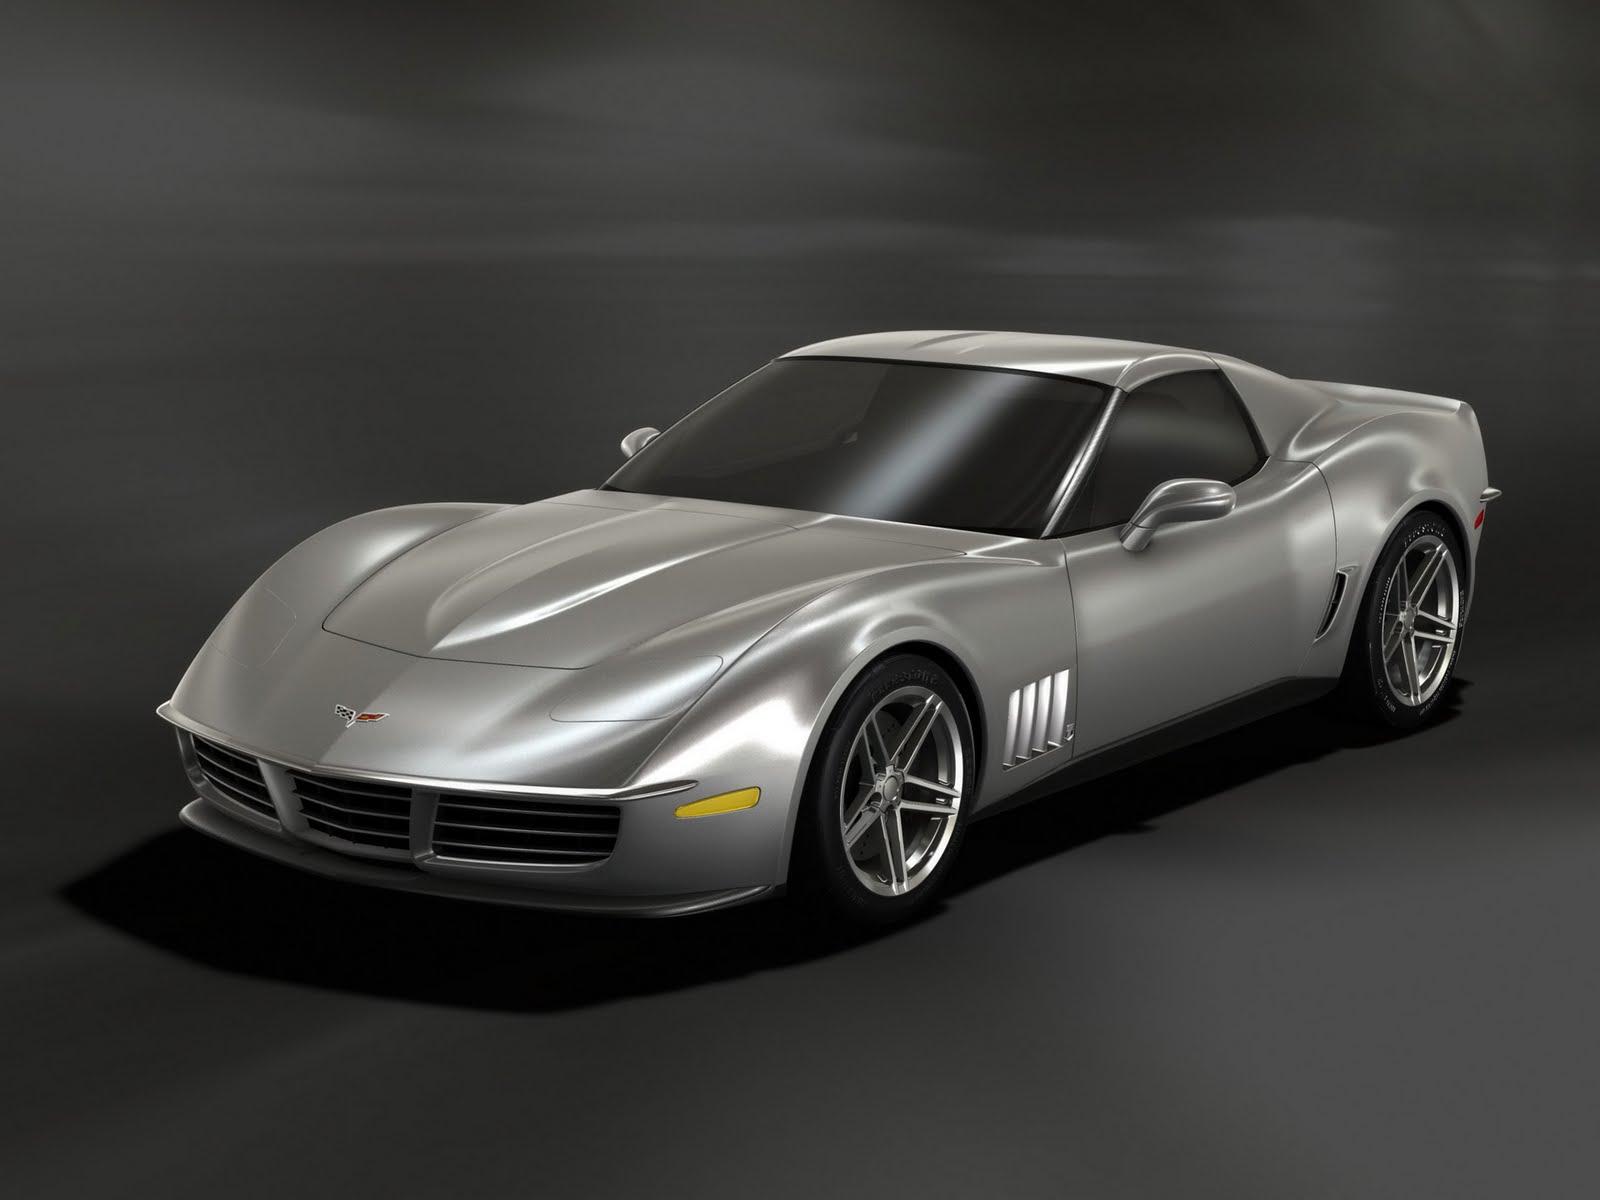 Westancebywestcoast: Concept Car Corvette C3 LOOK